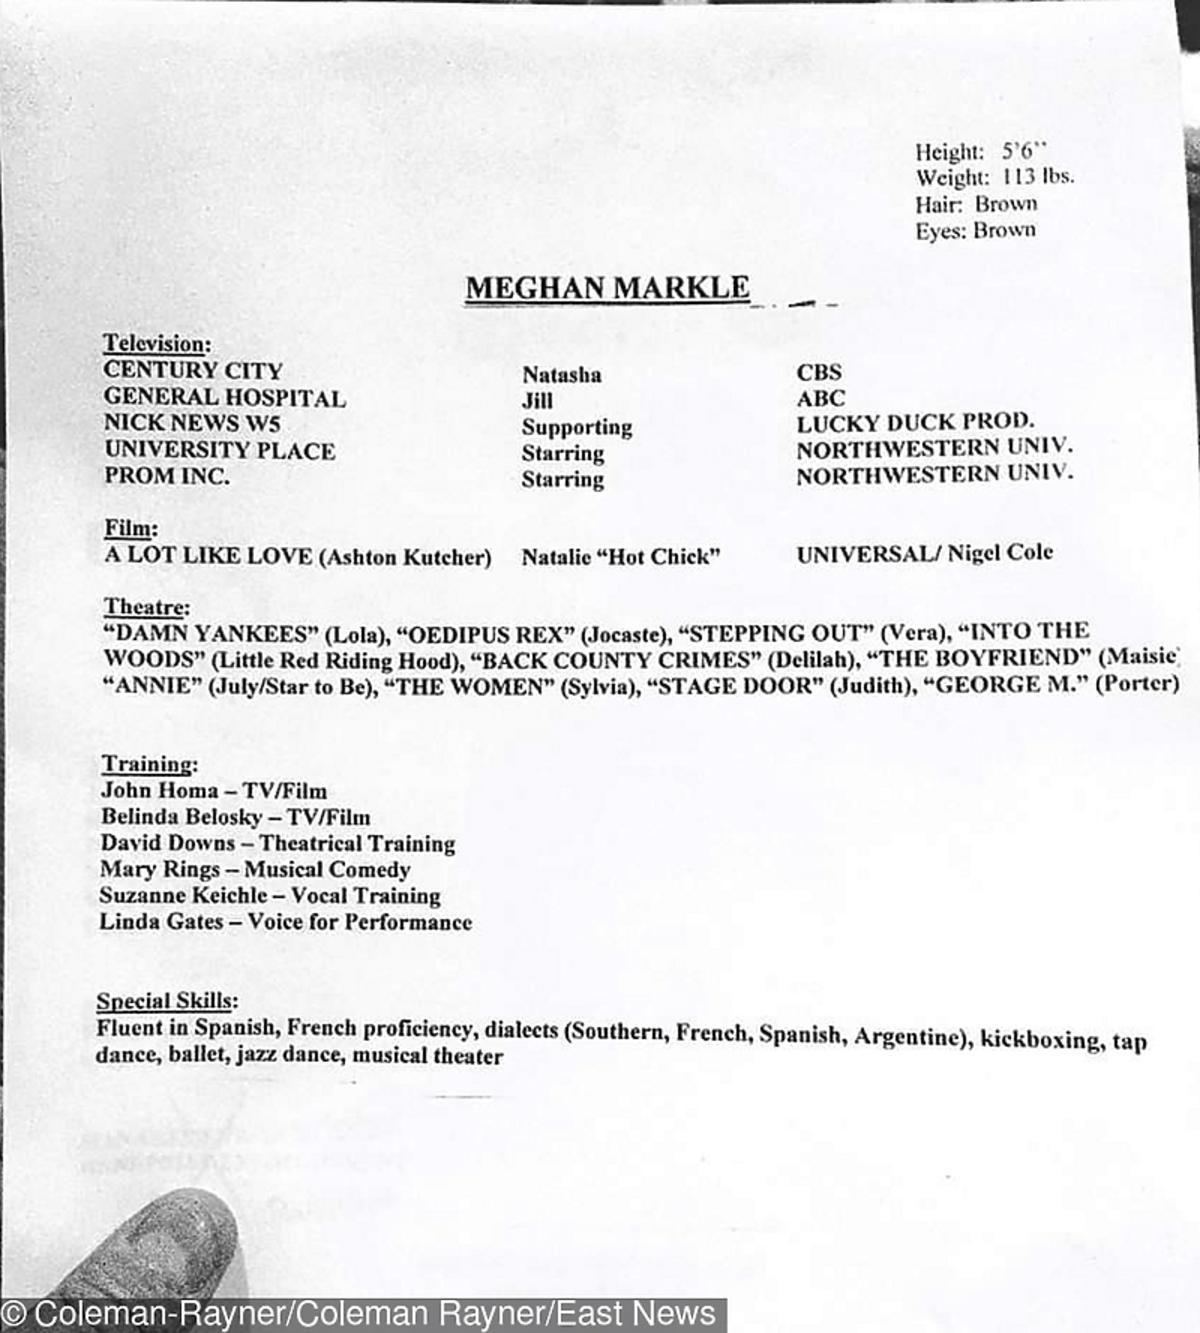 Meghan Markle CV